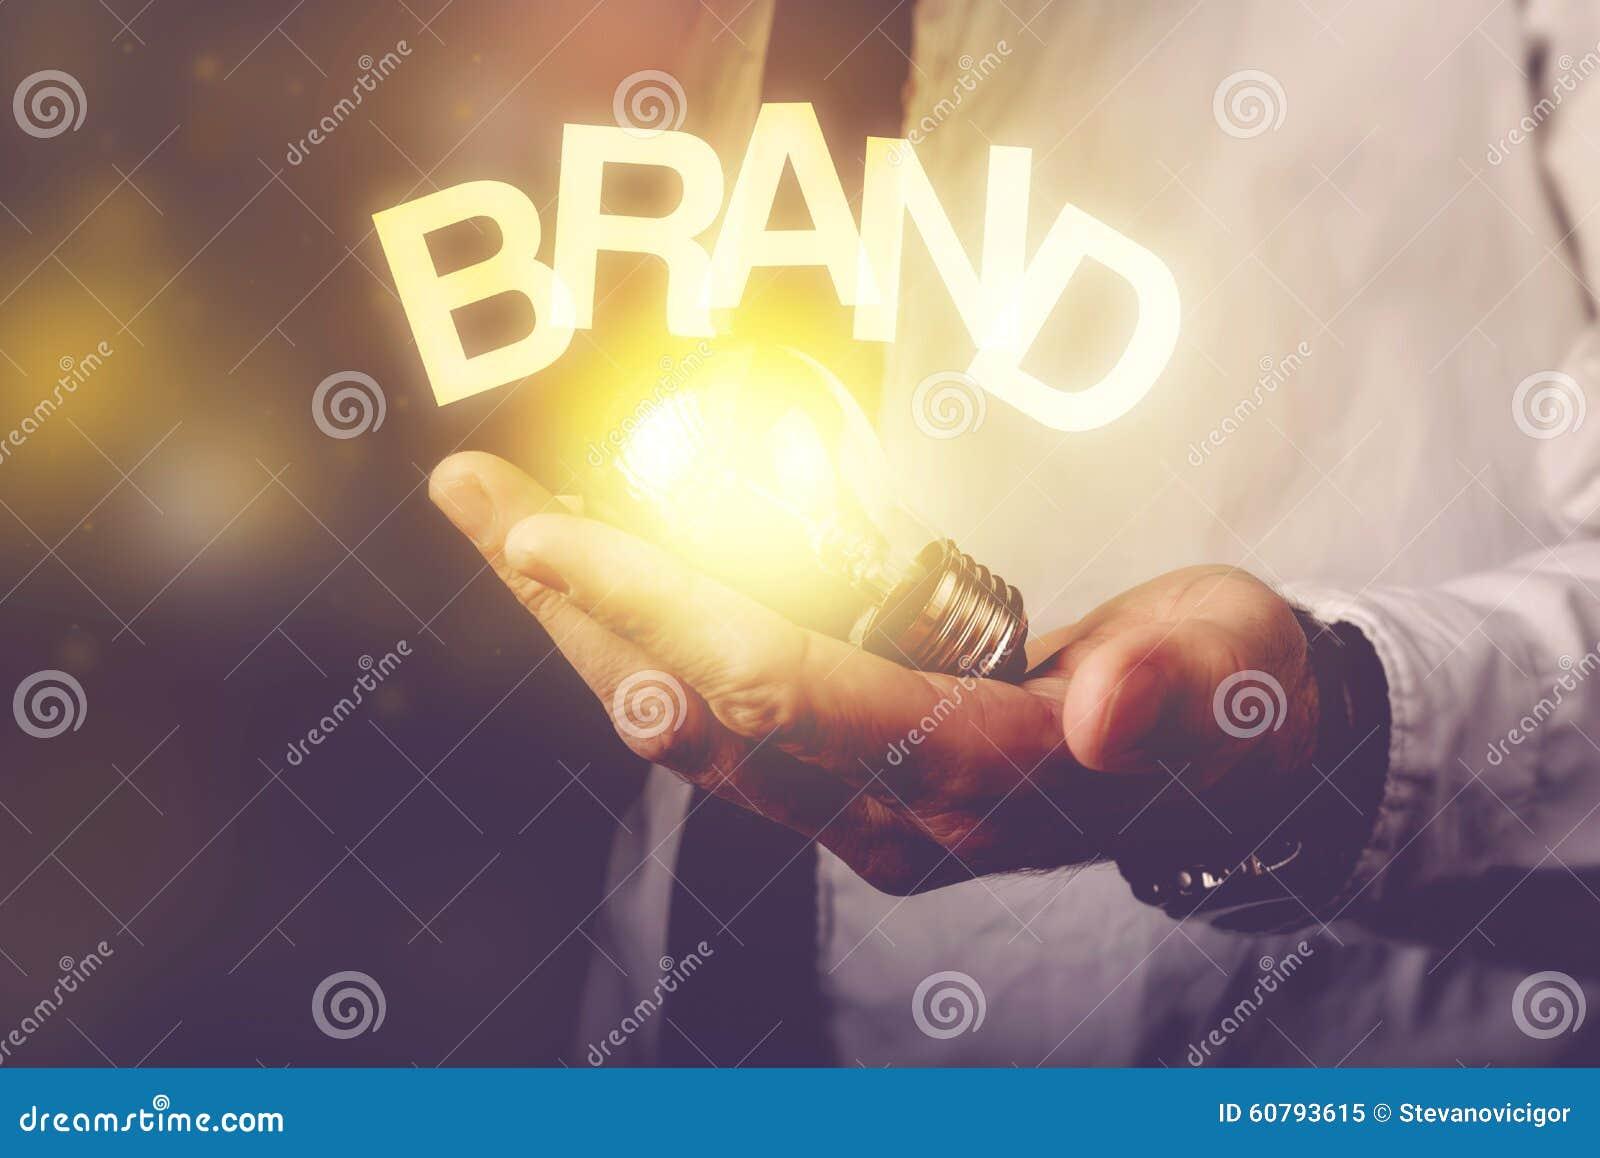 Идея бренда